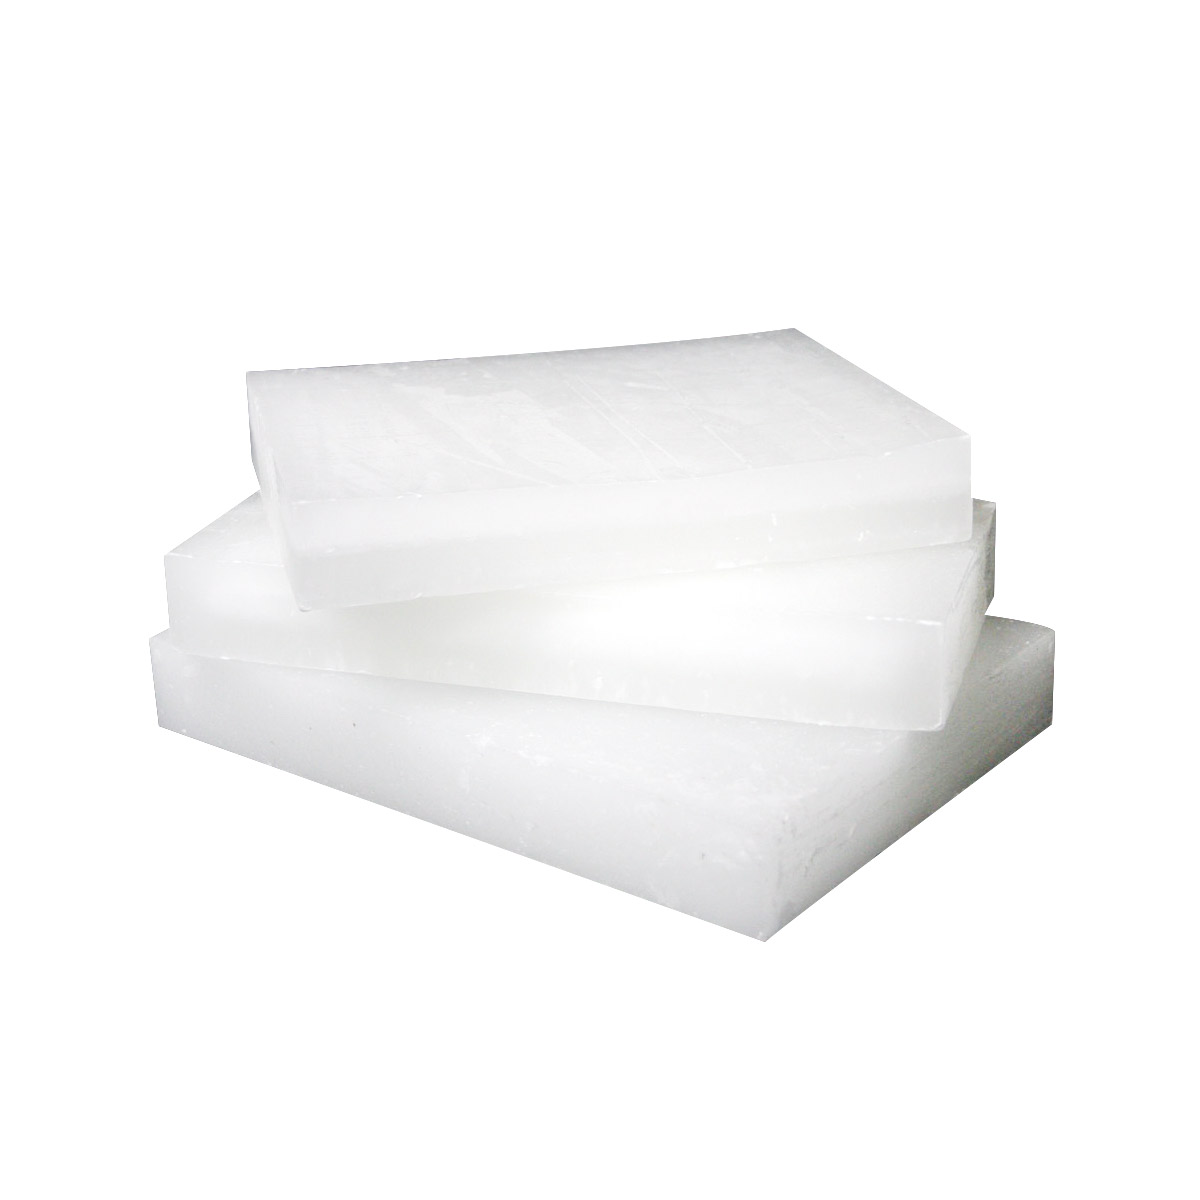 paraffin-wax-slabs